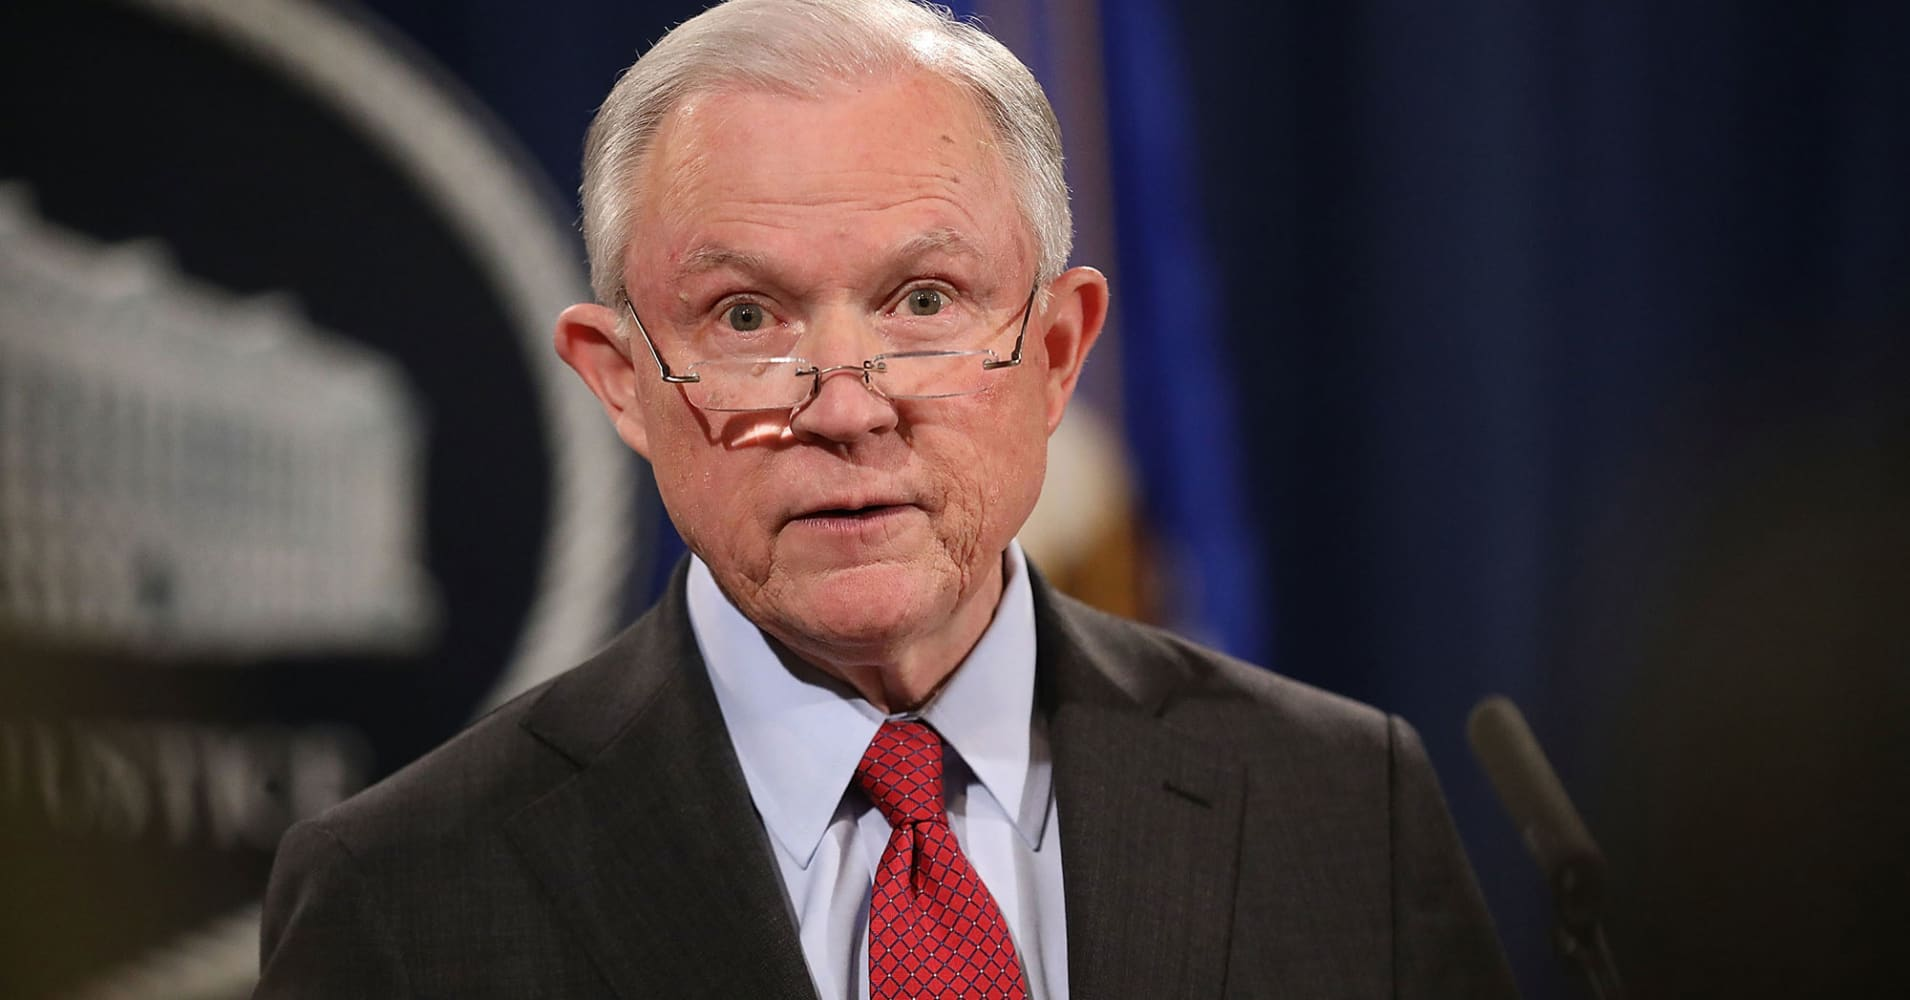 Judge denies Trump administration's bid to block California's immigrant sanctuary laws